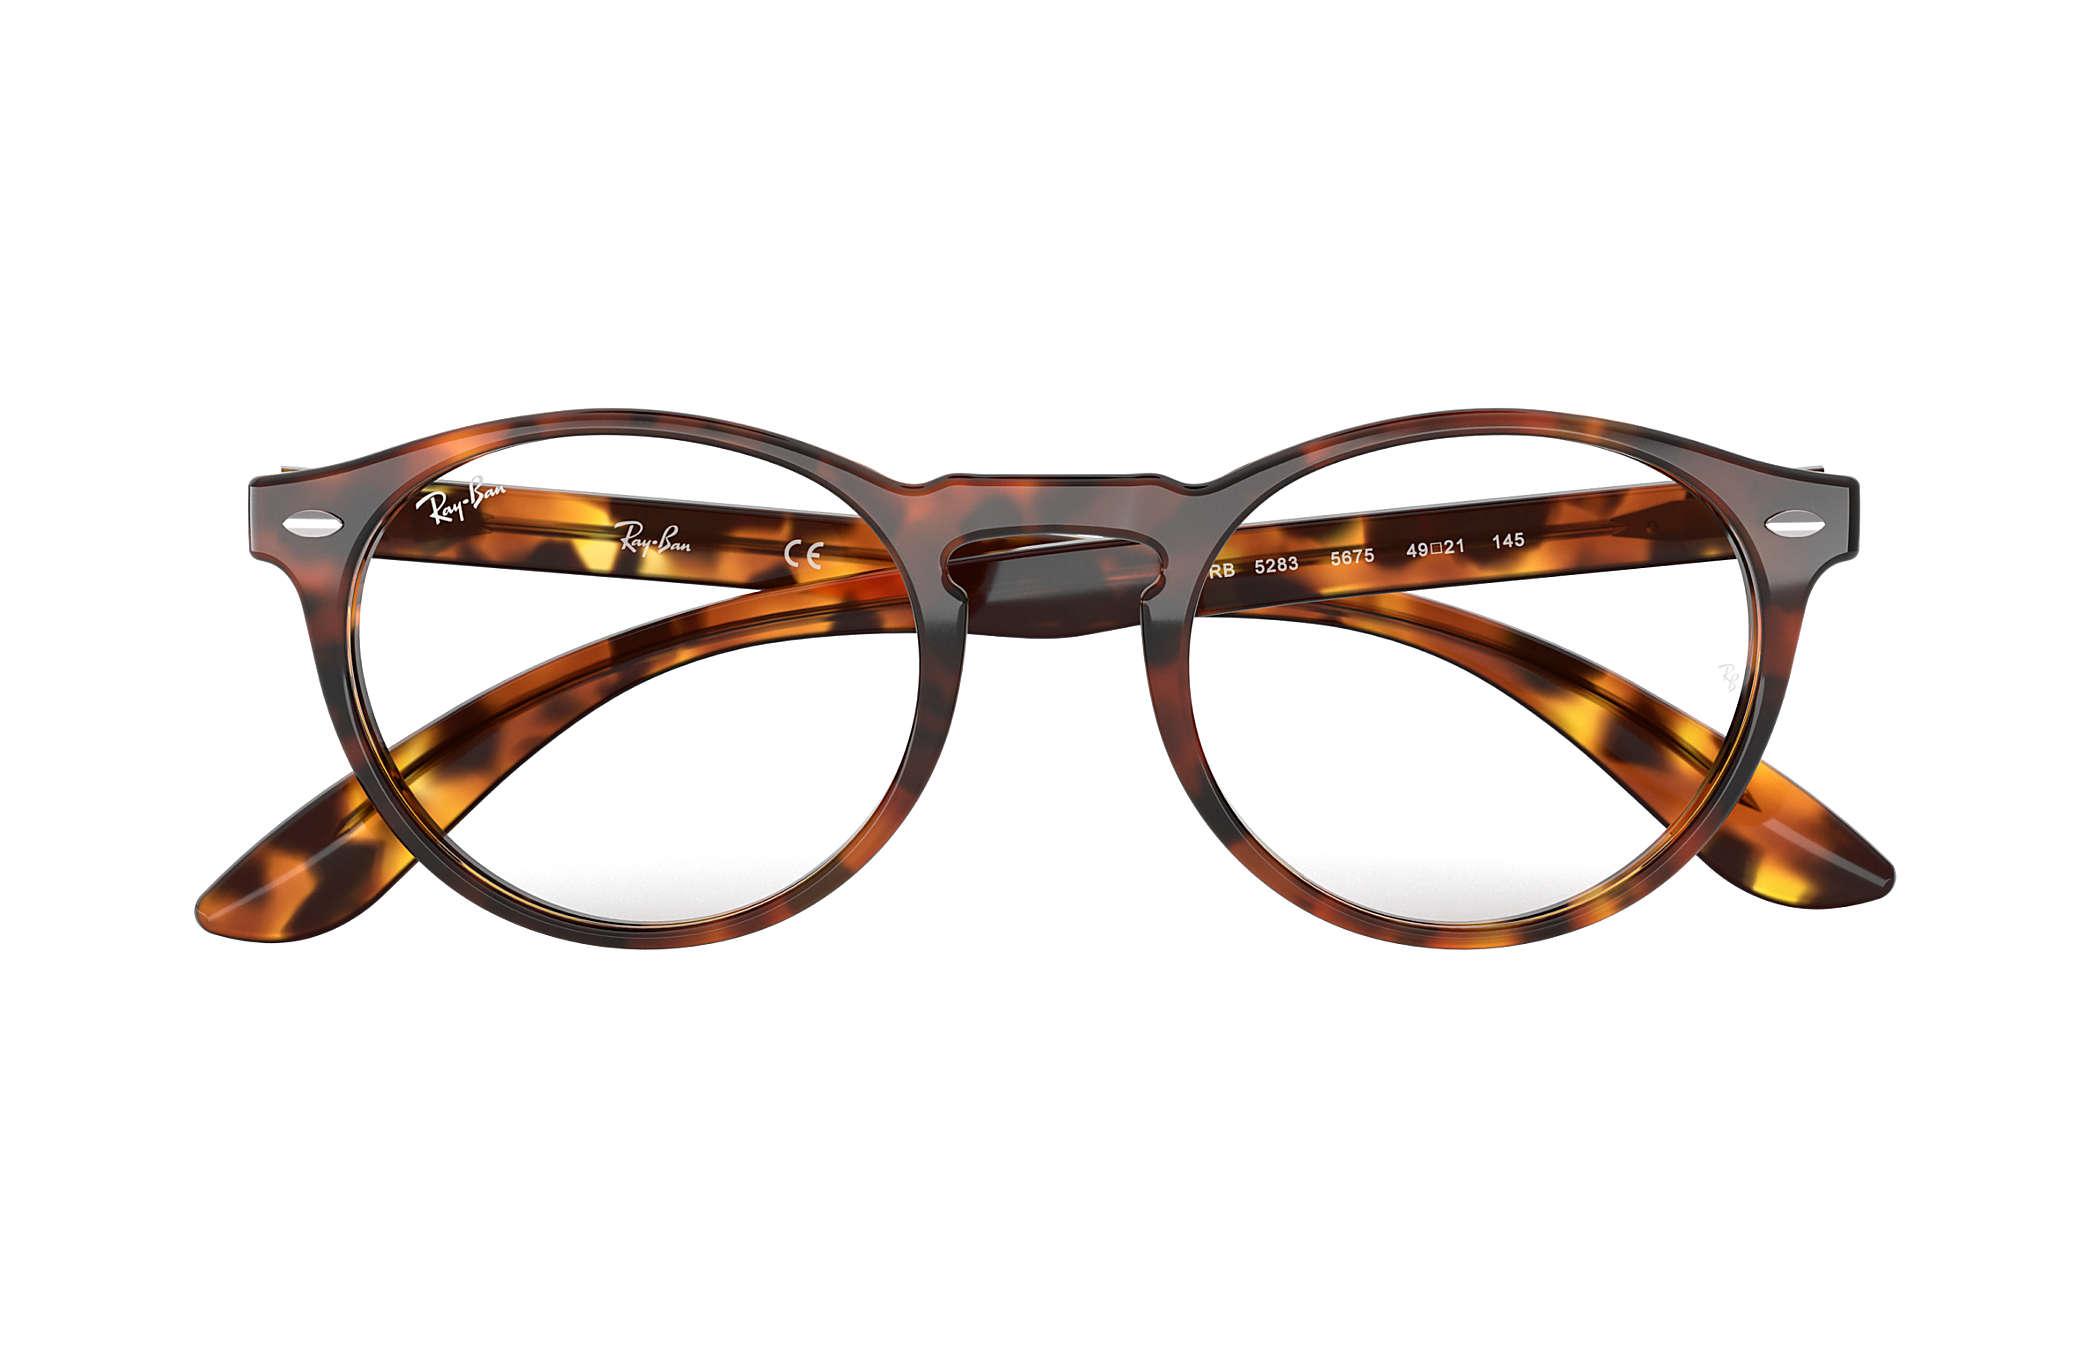 7cd195465ce56 Ray-Ban eyeglasses RB5283 Tortoise - Acetate - 0RX5283567551